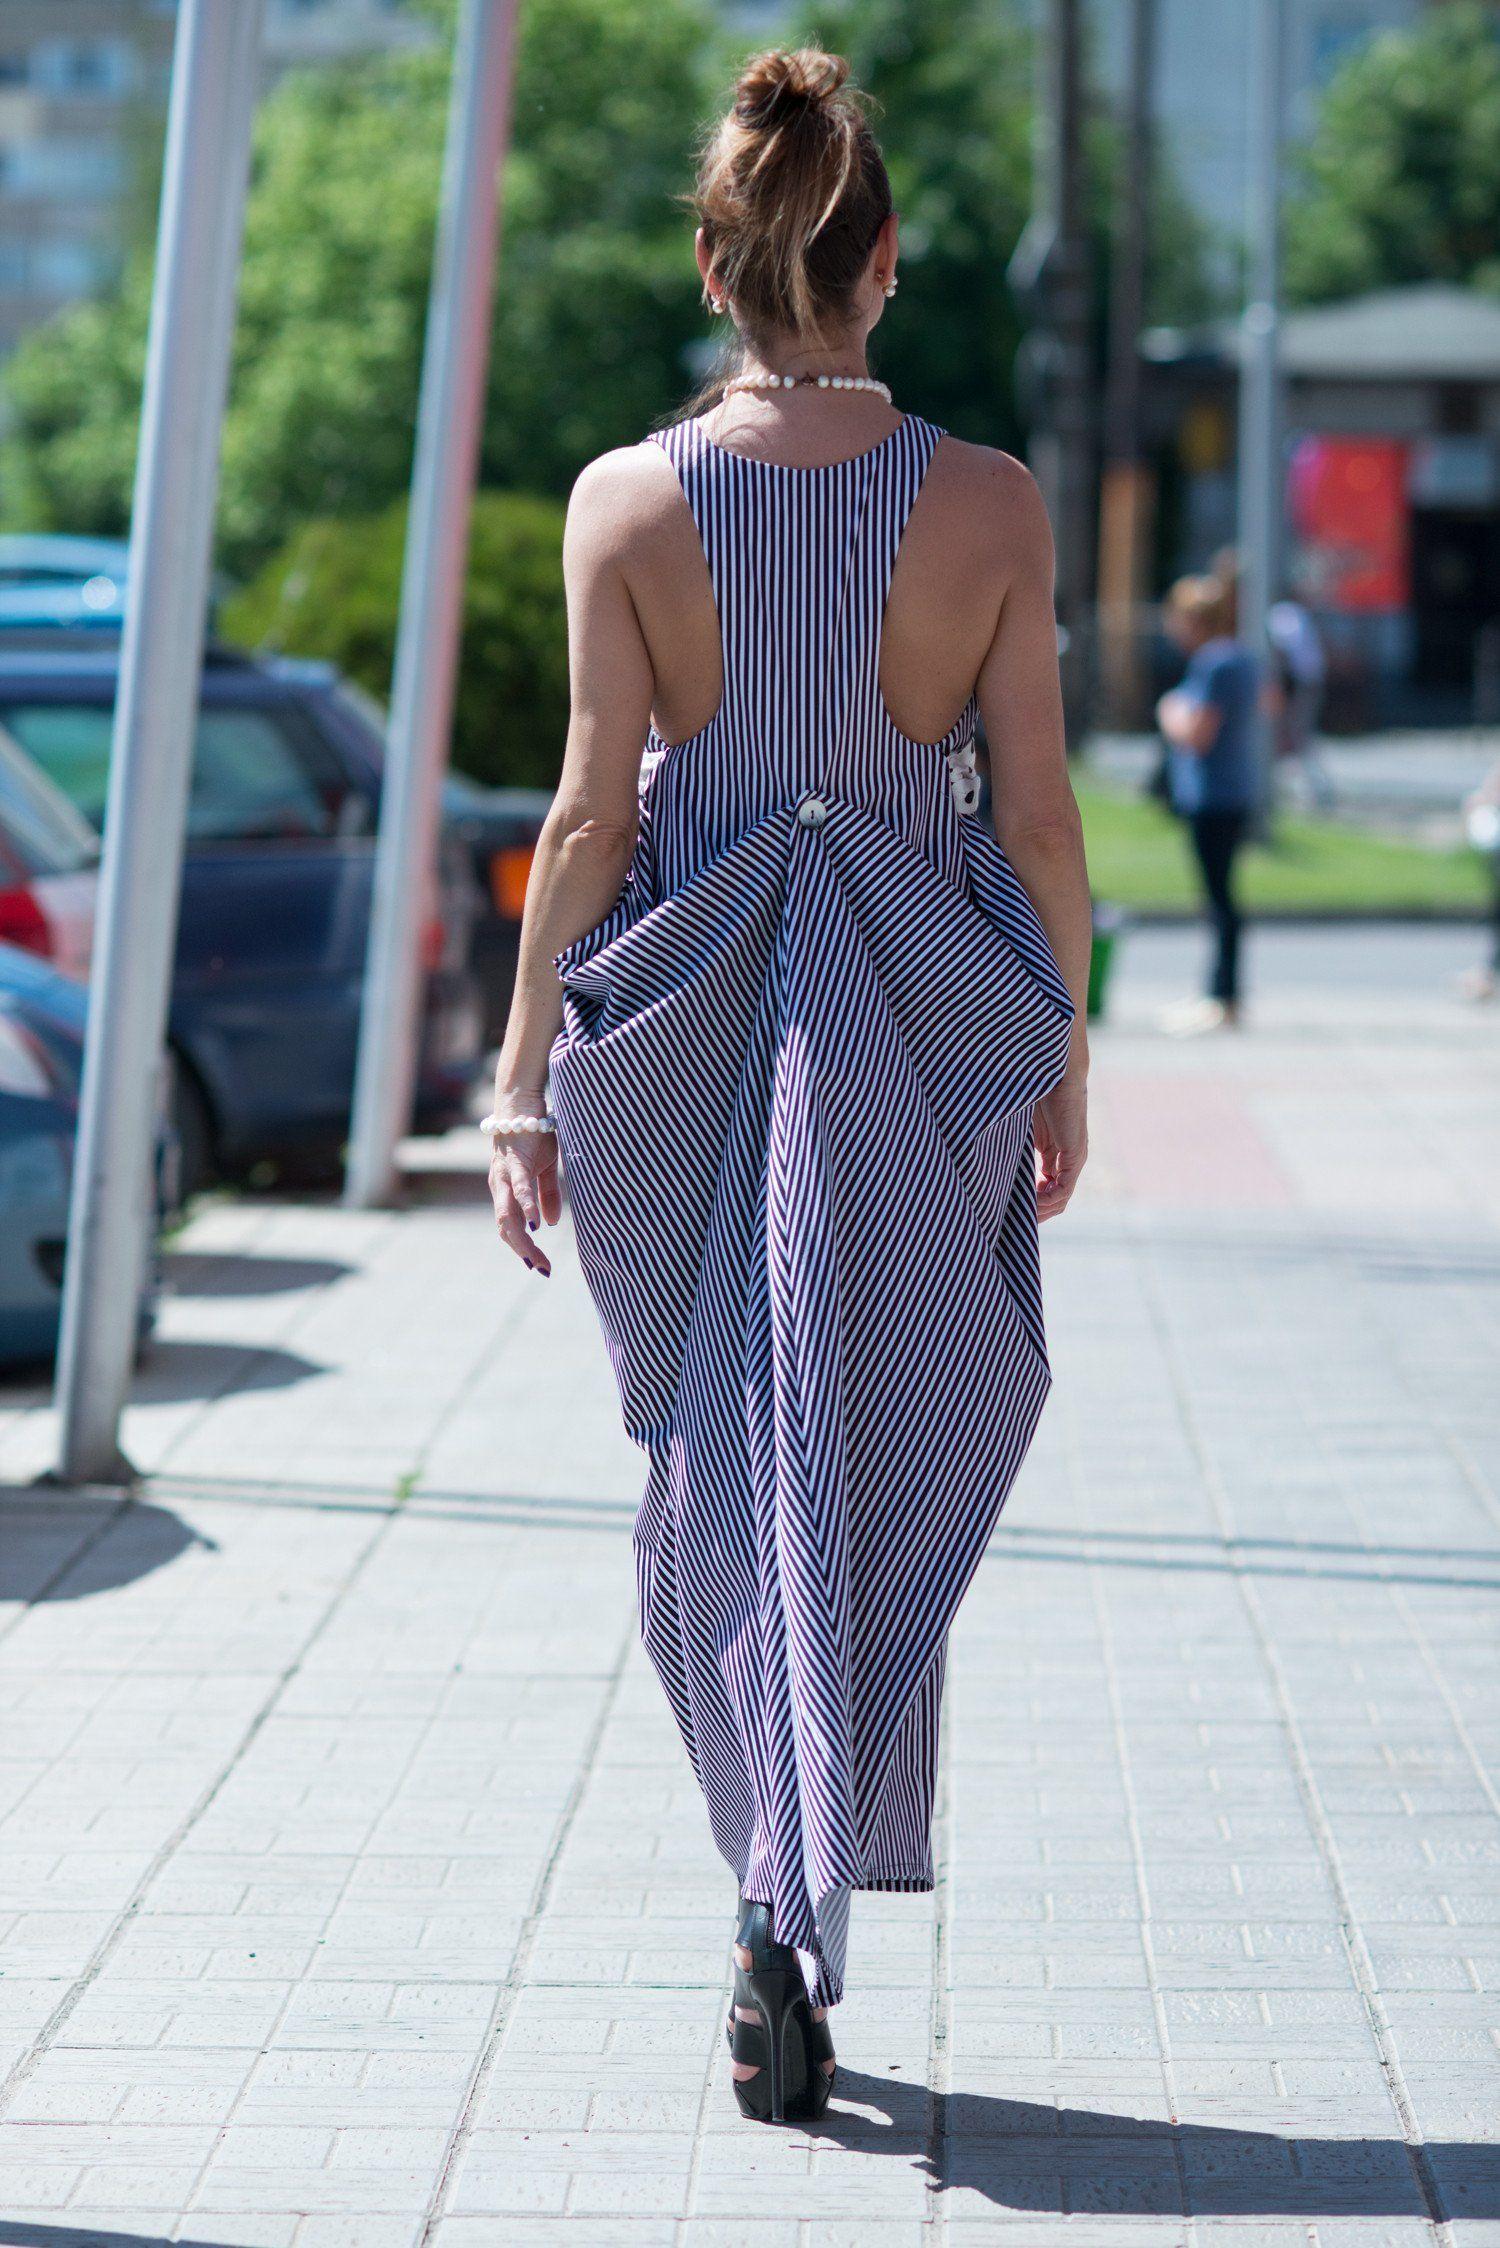 Cotton stripped dresses plus size clothing boho dress long dress